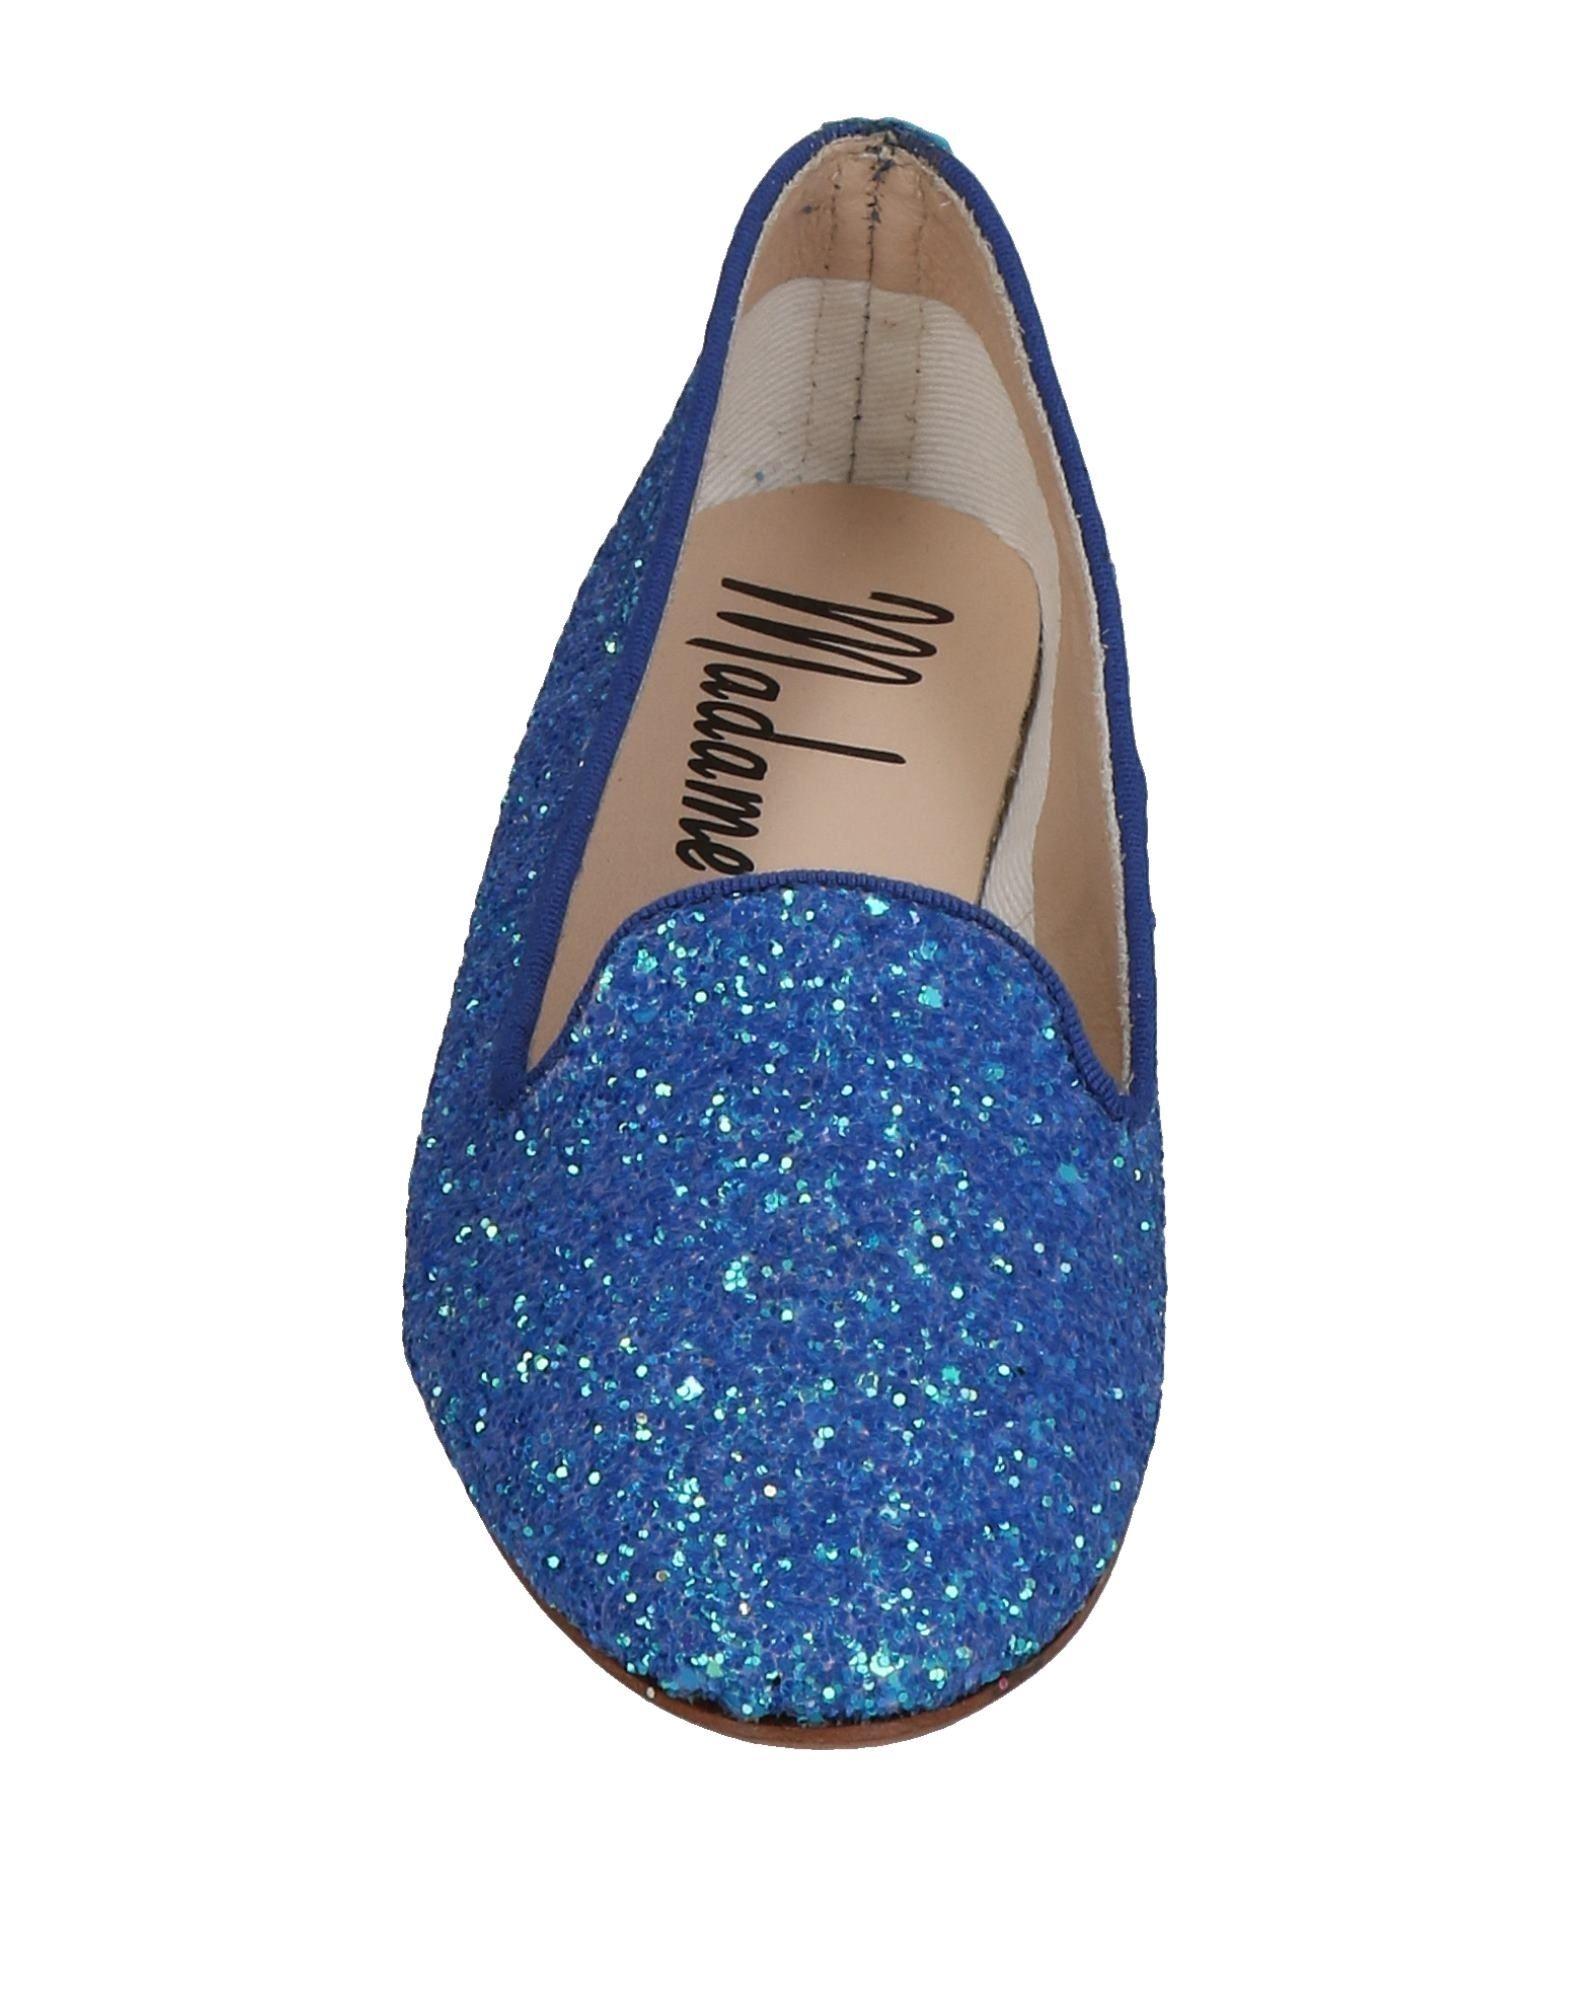 Madame 11459147MA Ines Mokassins Damen  11459147MA Madame Gute Qualität beliebte Schuhe 8b0724